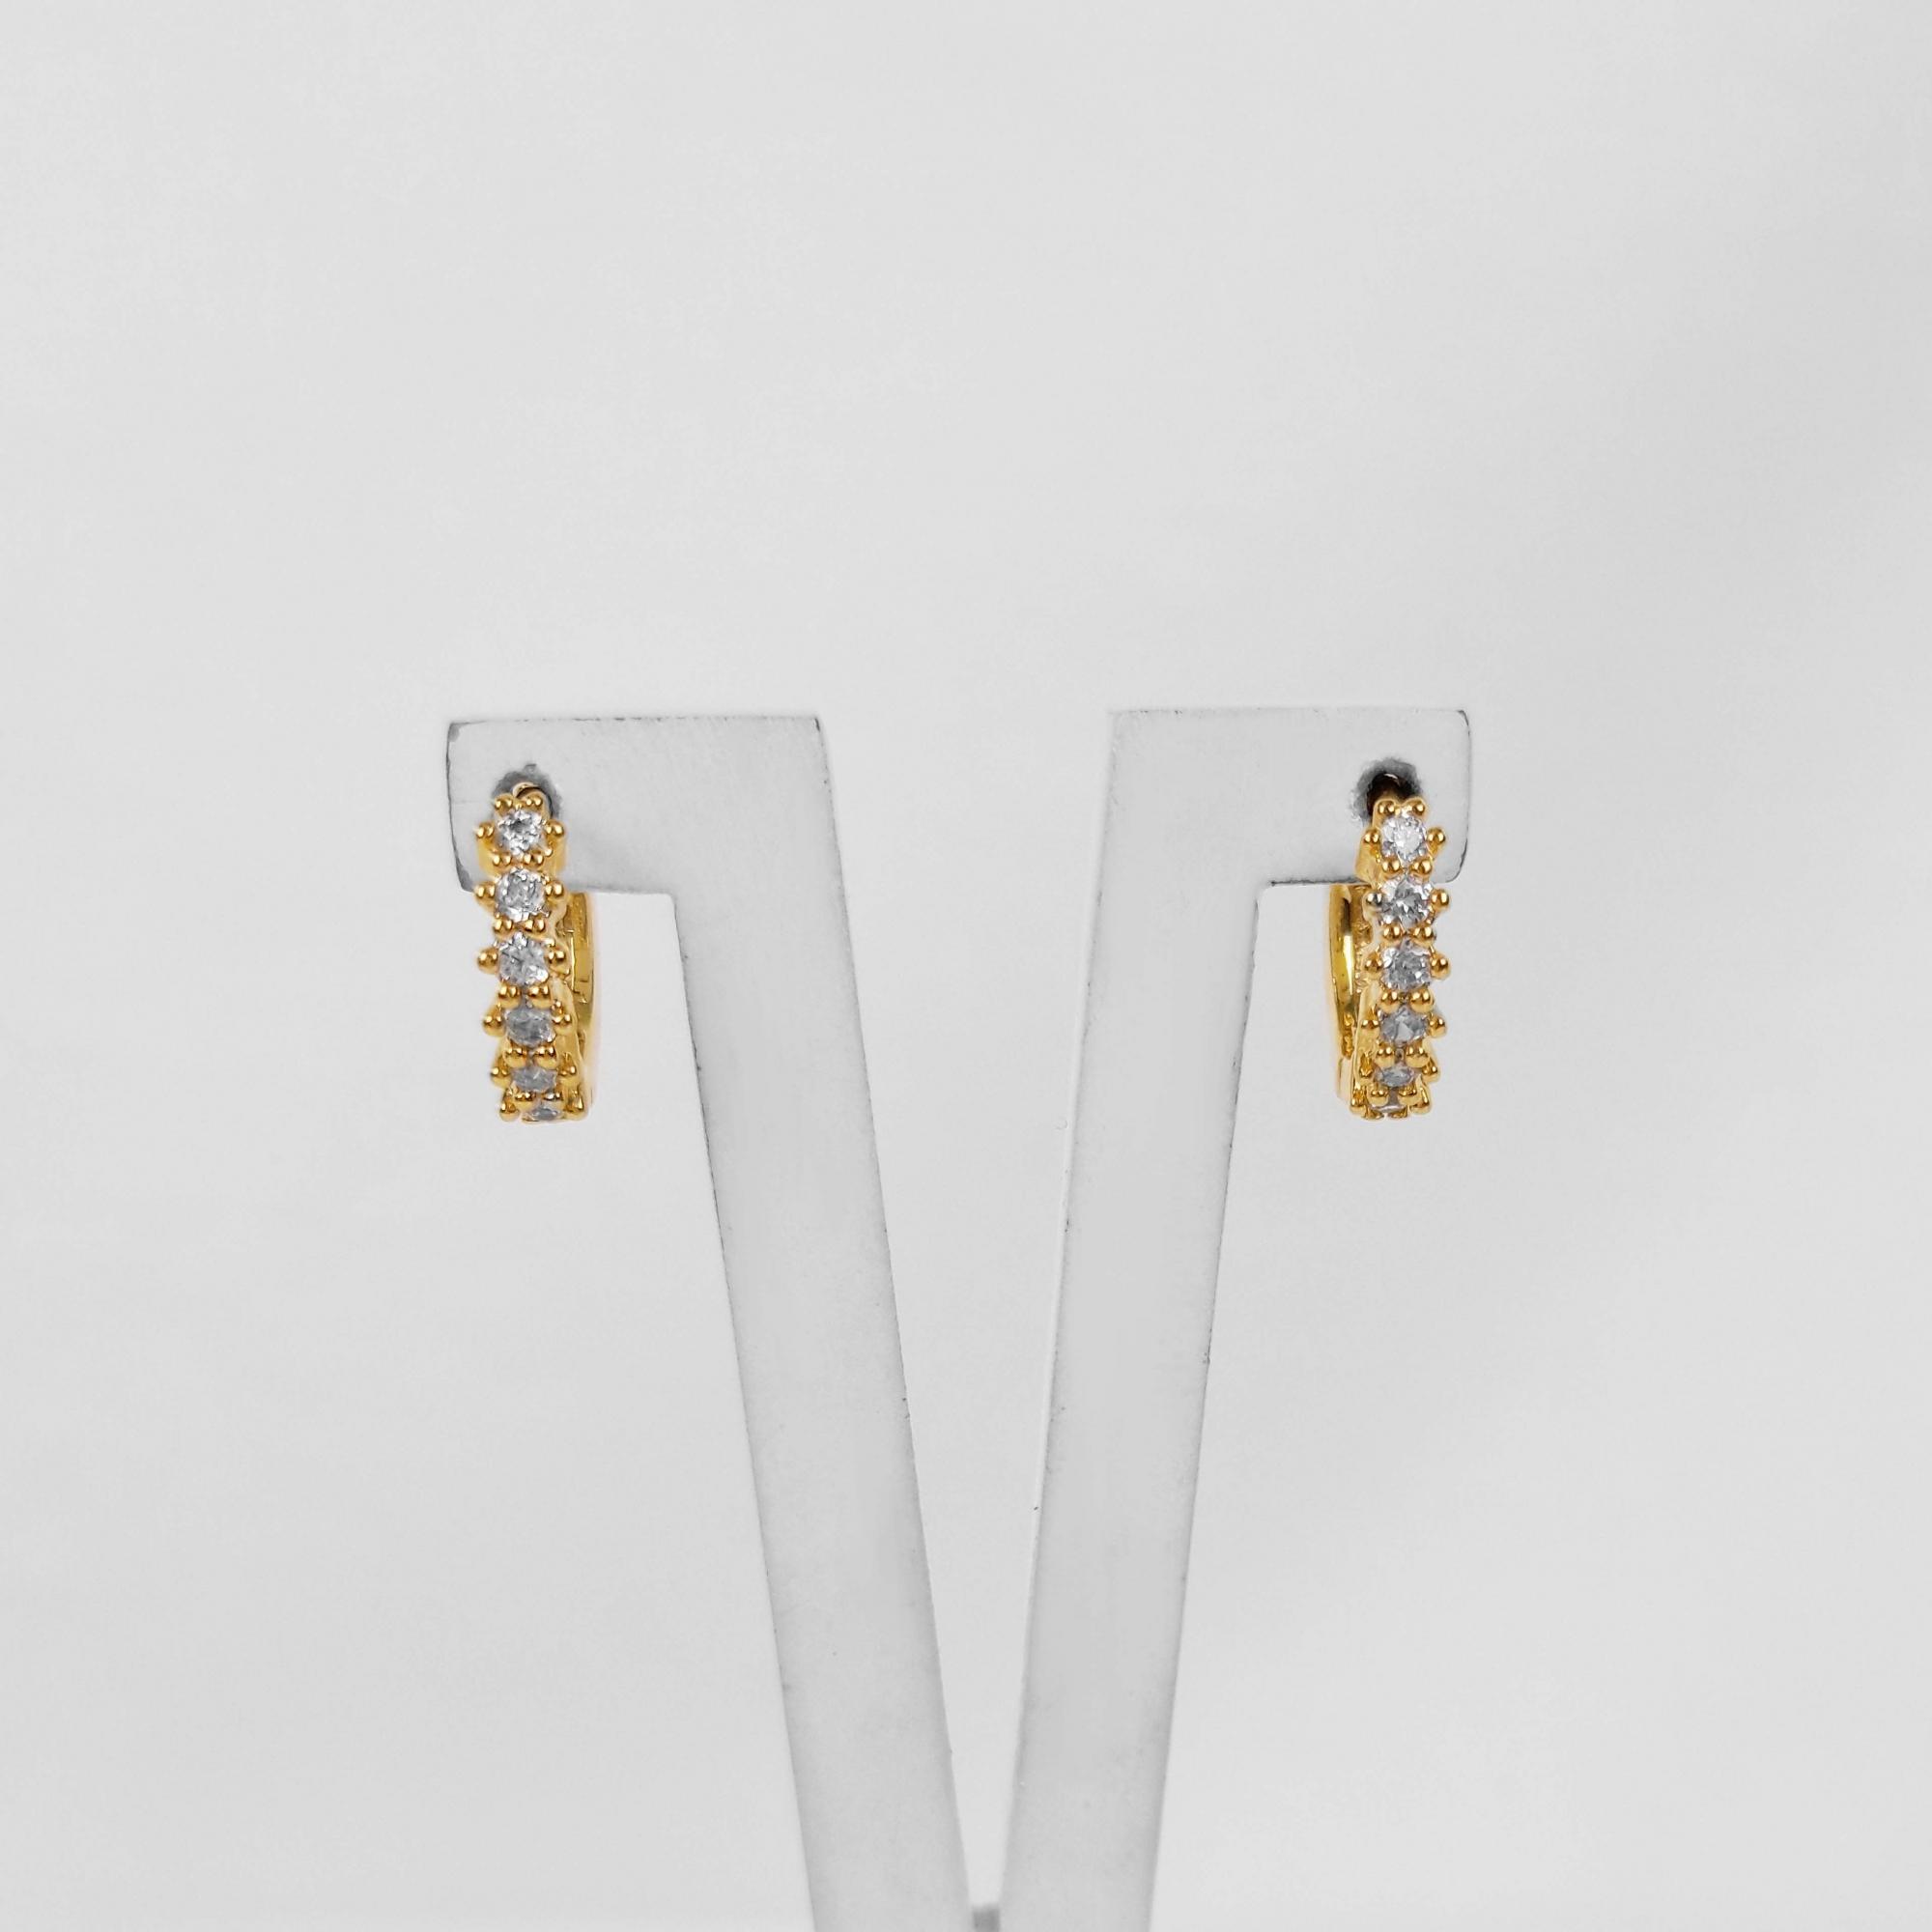 Brinco Argola Filete de Zircônia 1,1cm Folheado Ouro 18K  - Lunozê Joias